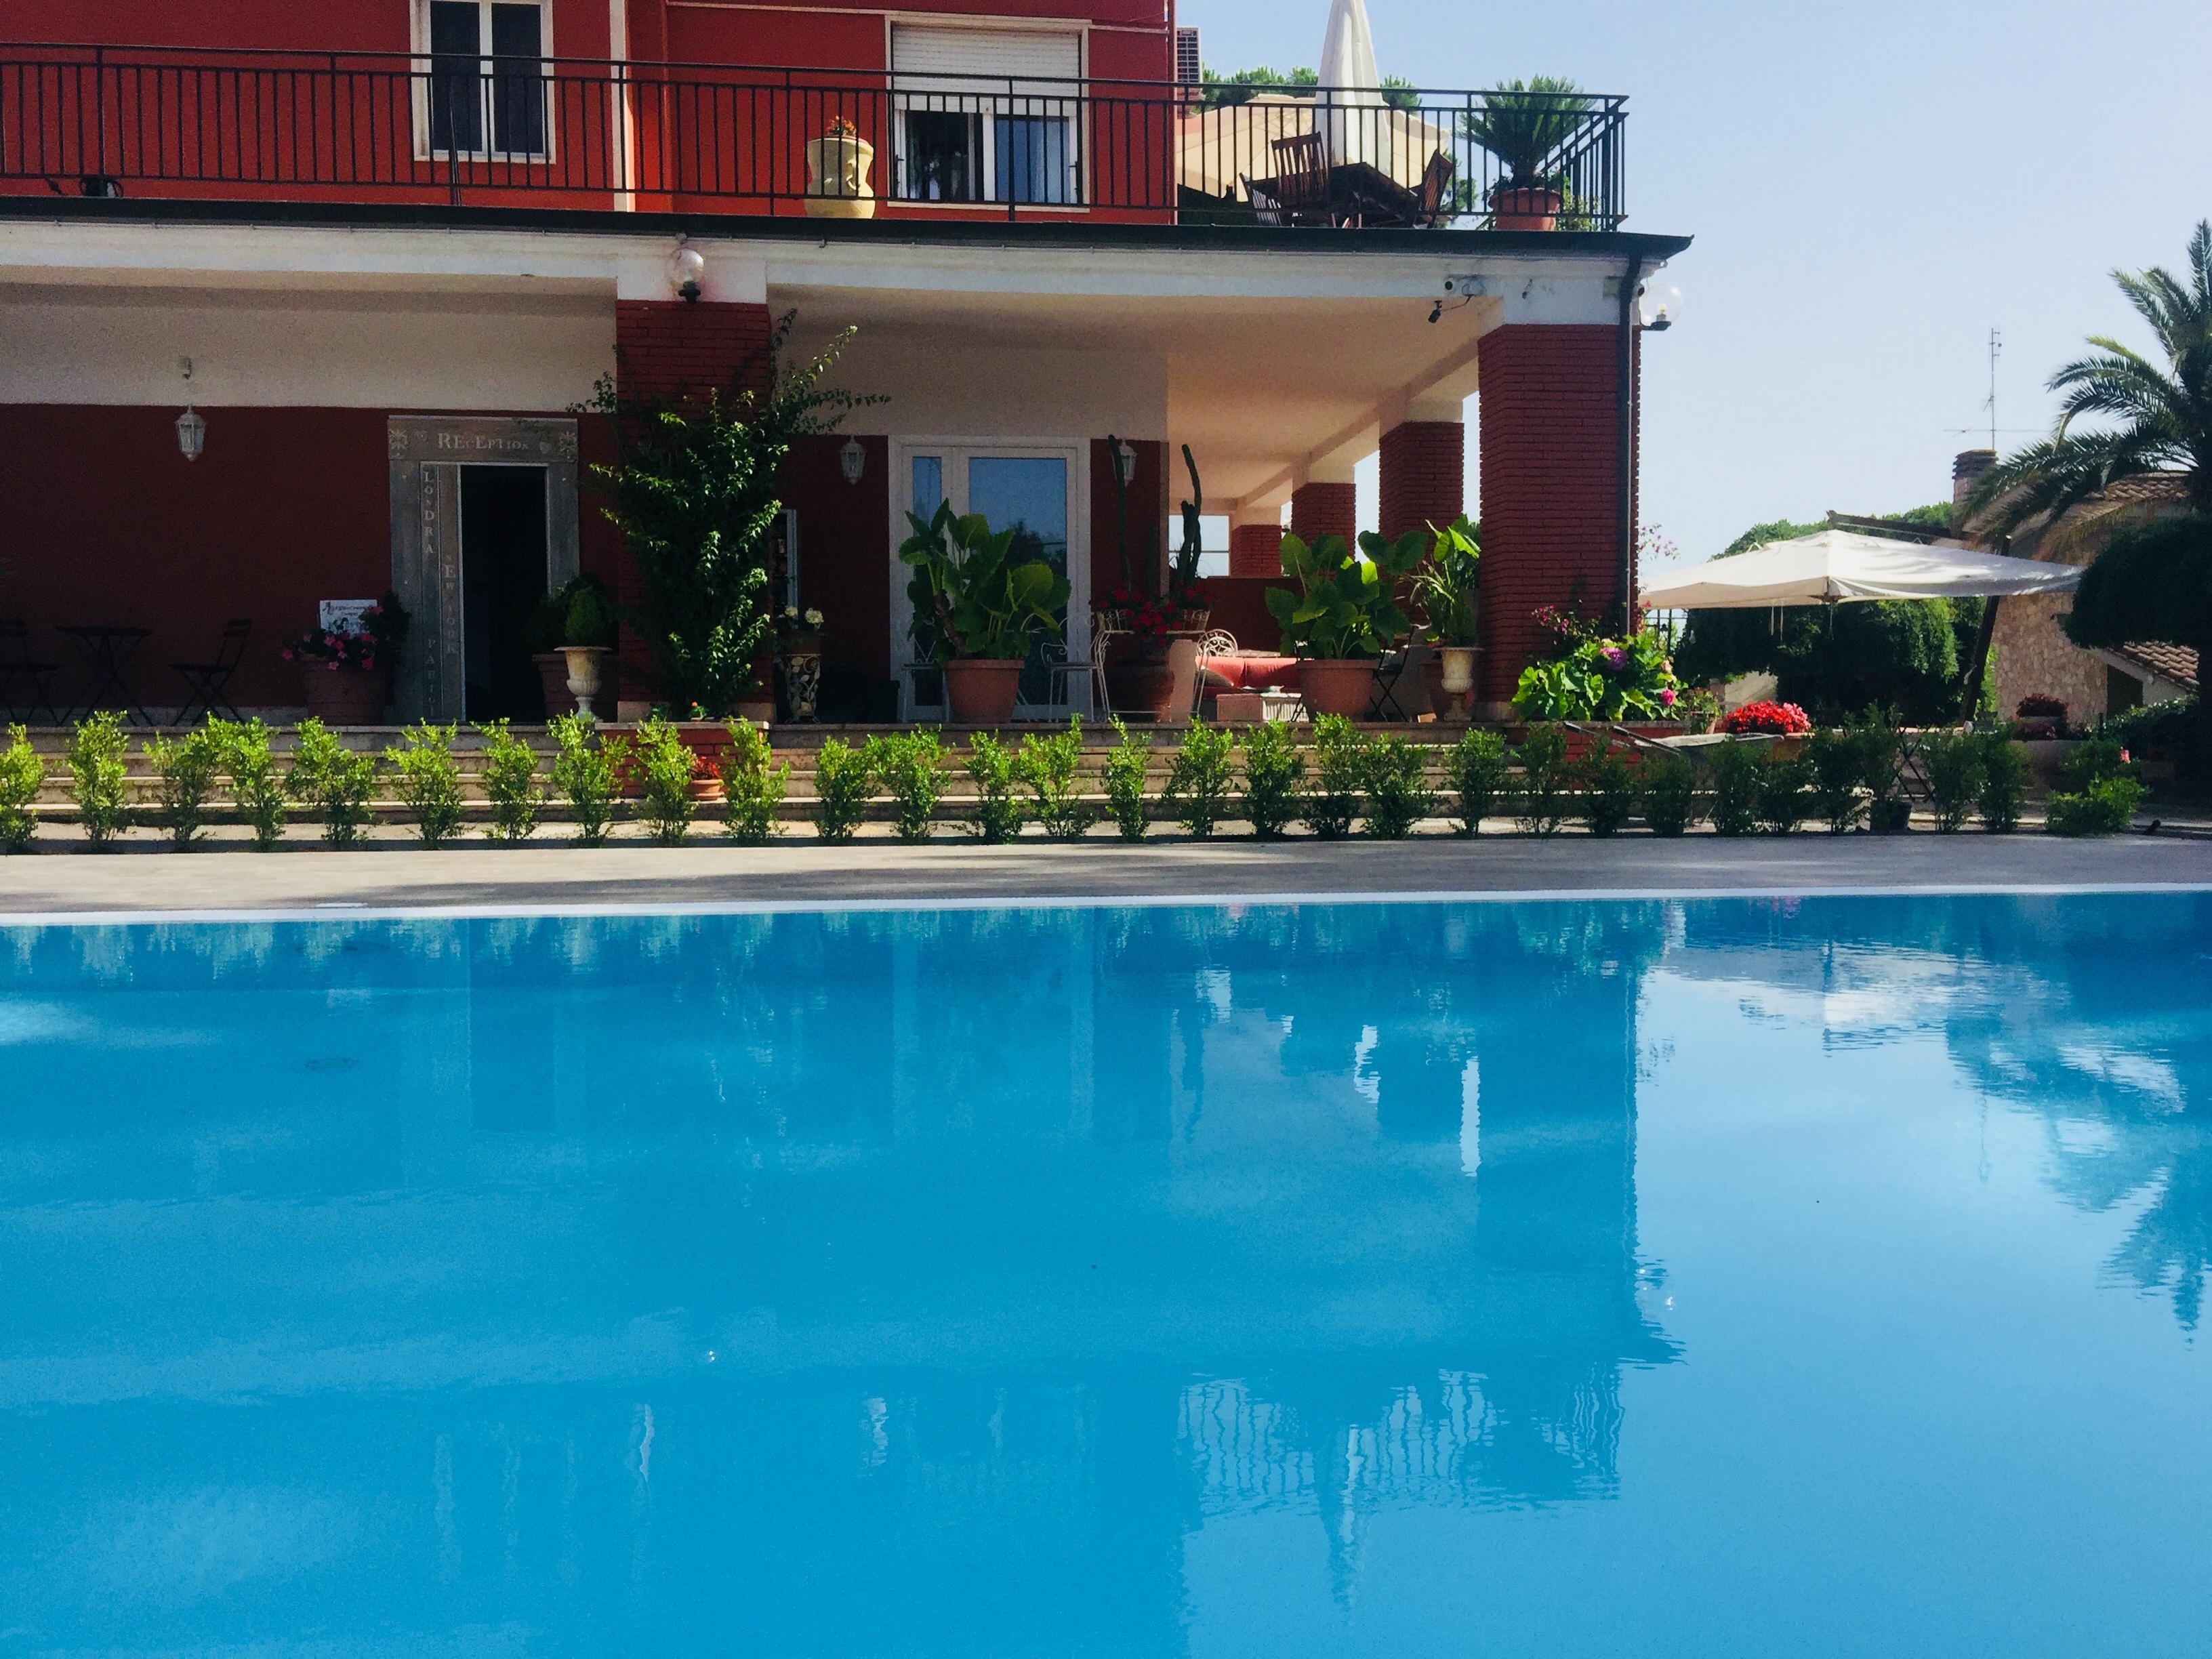 Piscina relais villa italia - Villa italia piscina ...